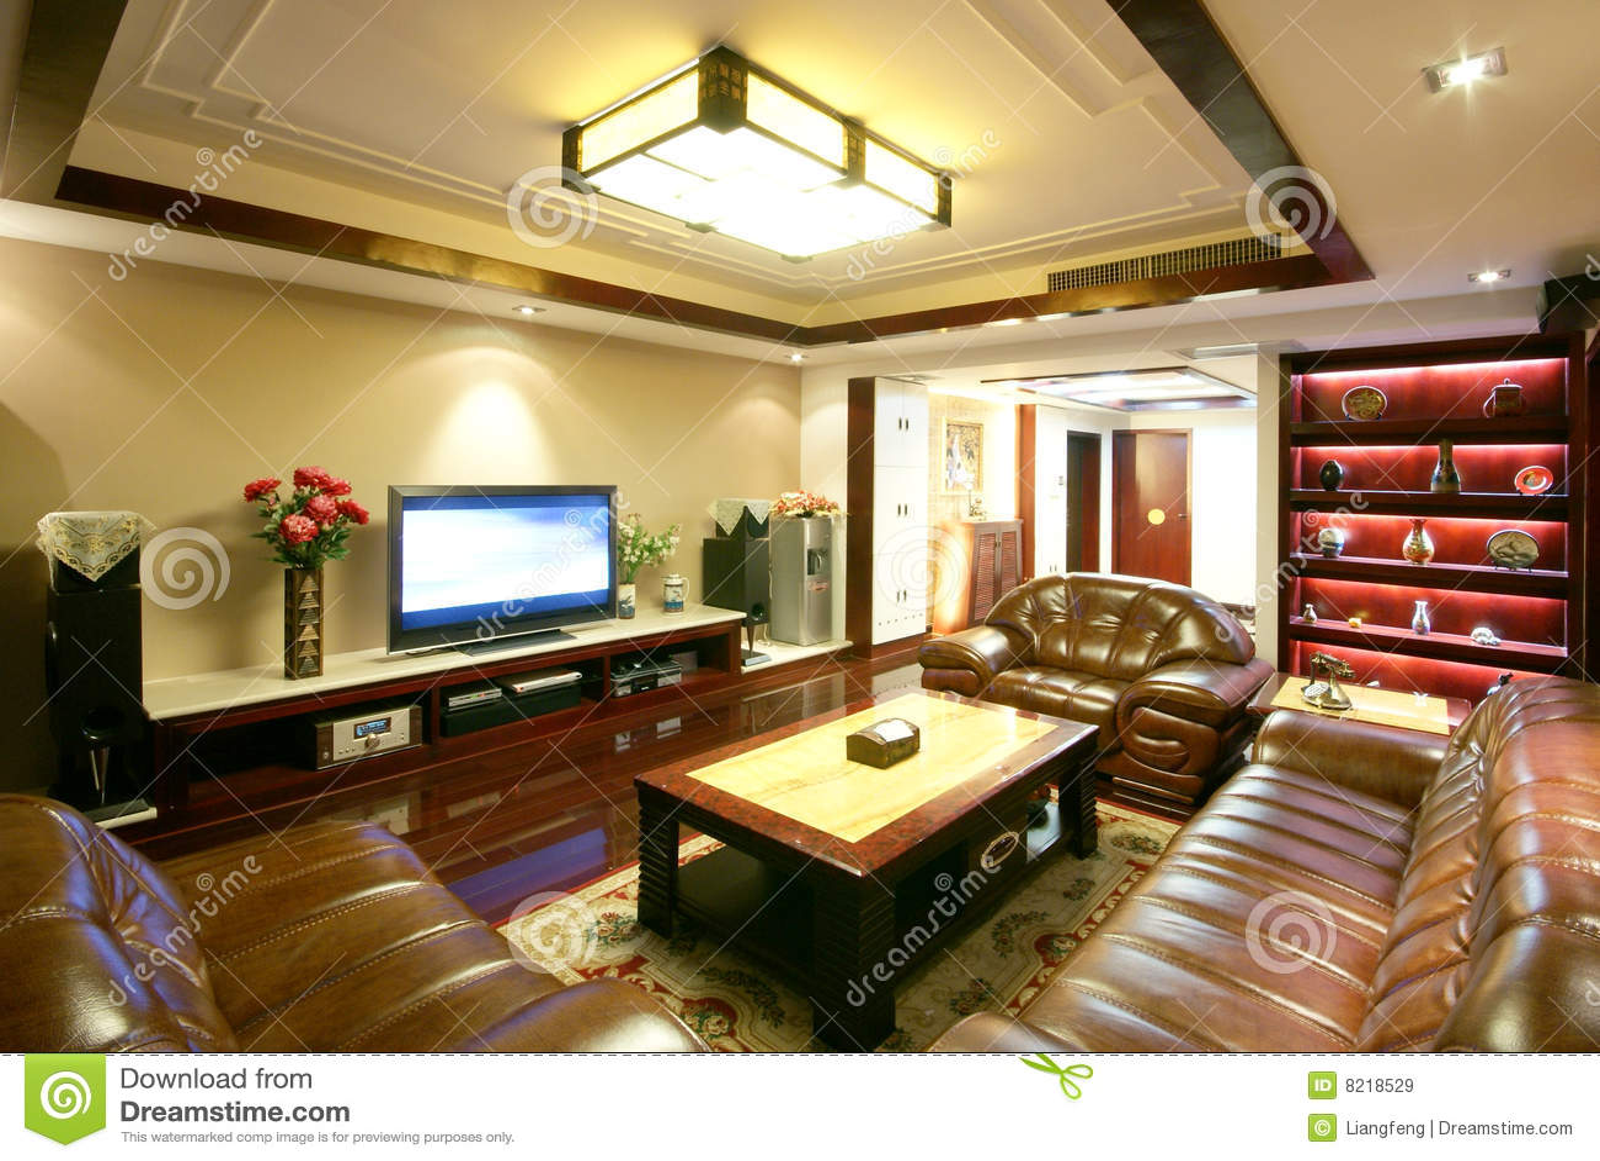 Unique decoration and comfortable house